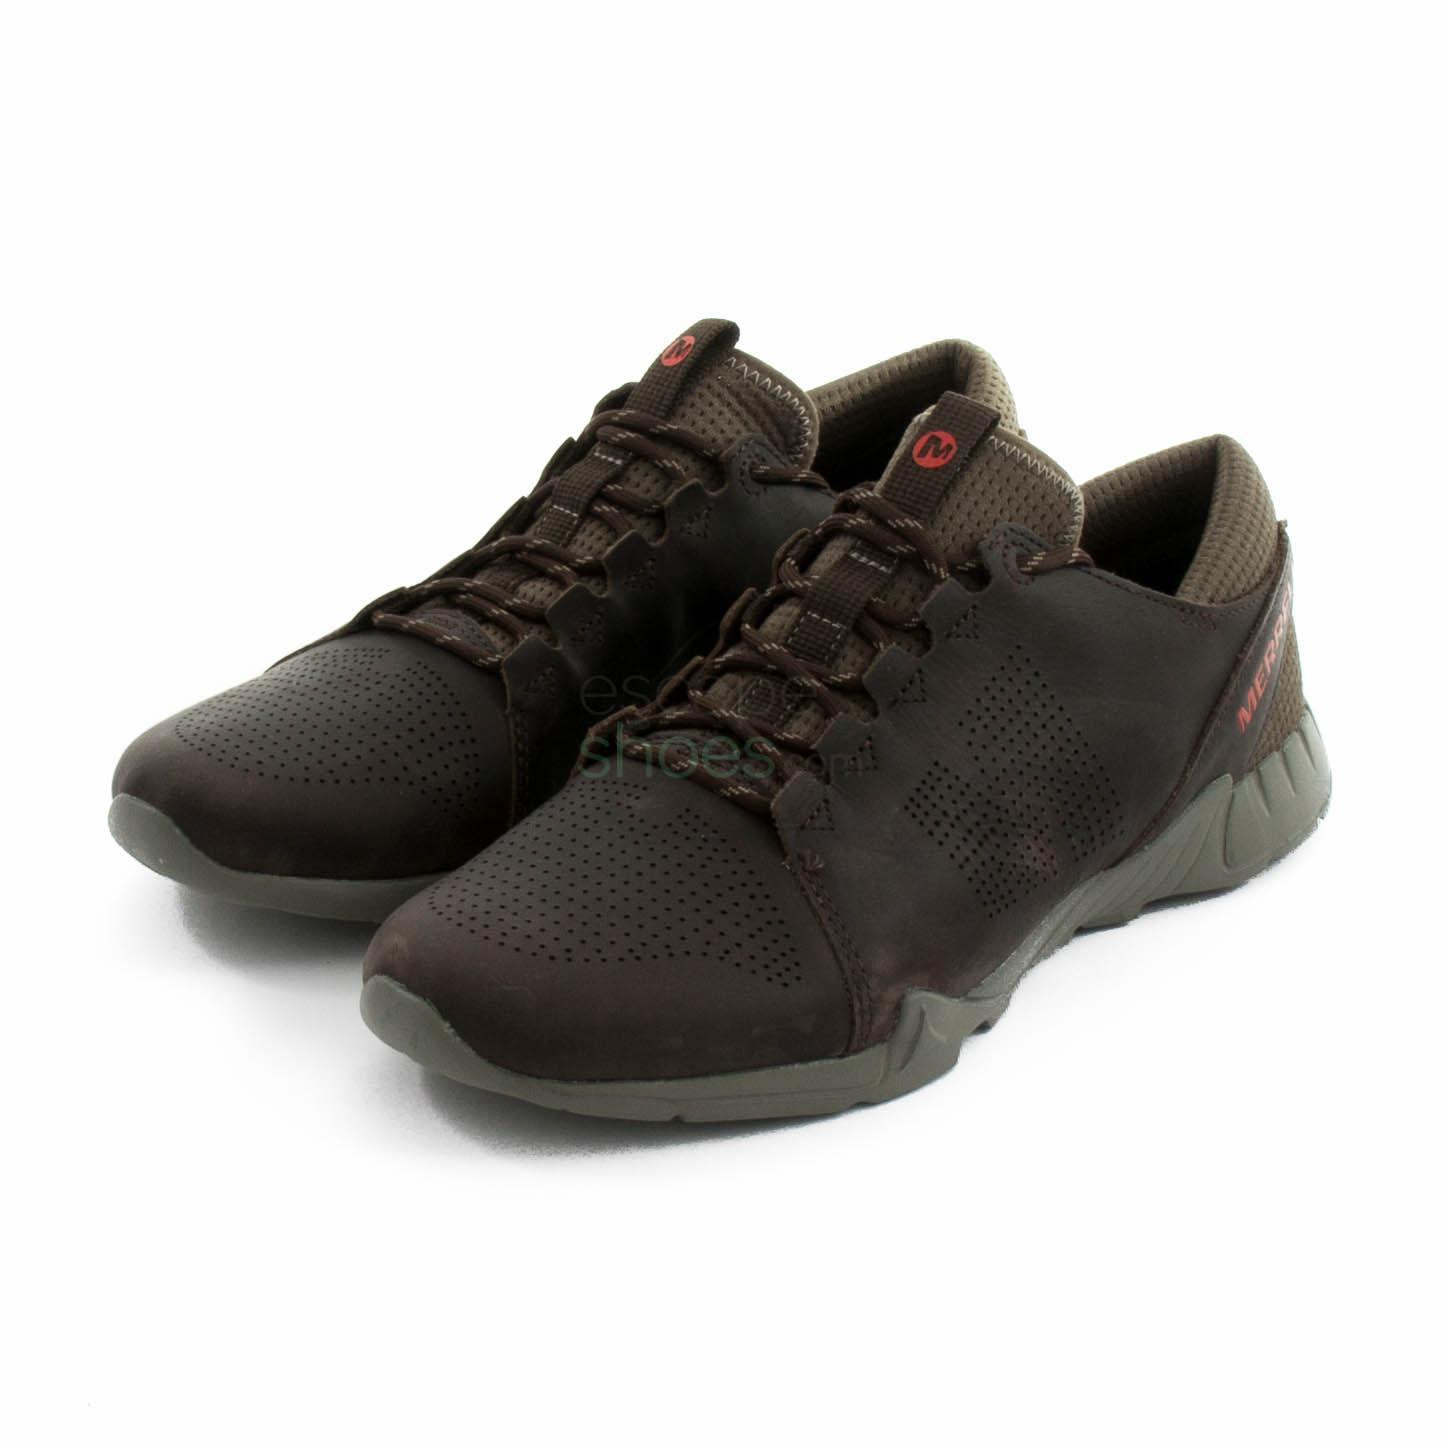 ce99488a75446 Buy your Sneakers MERRELL Versent Kavari Lace Dark Brown J93865 here ...